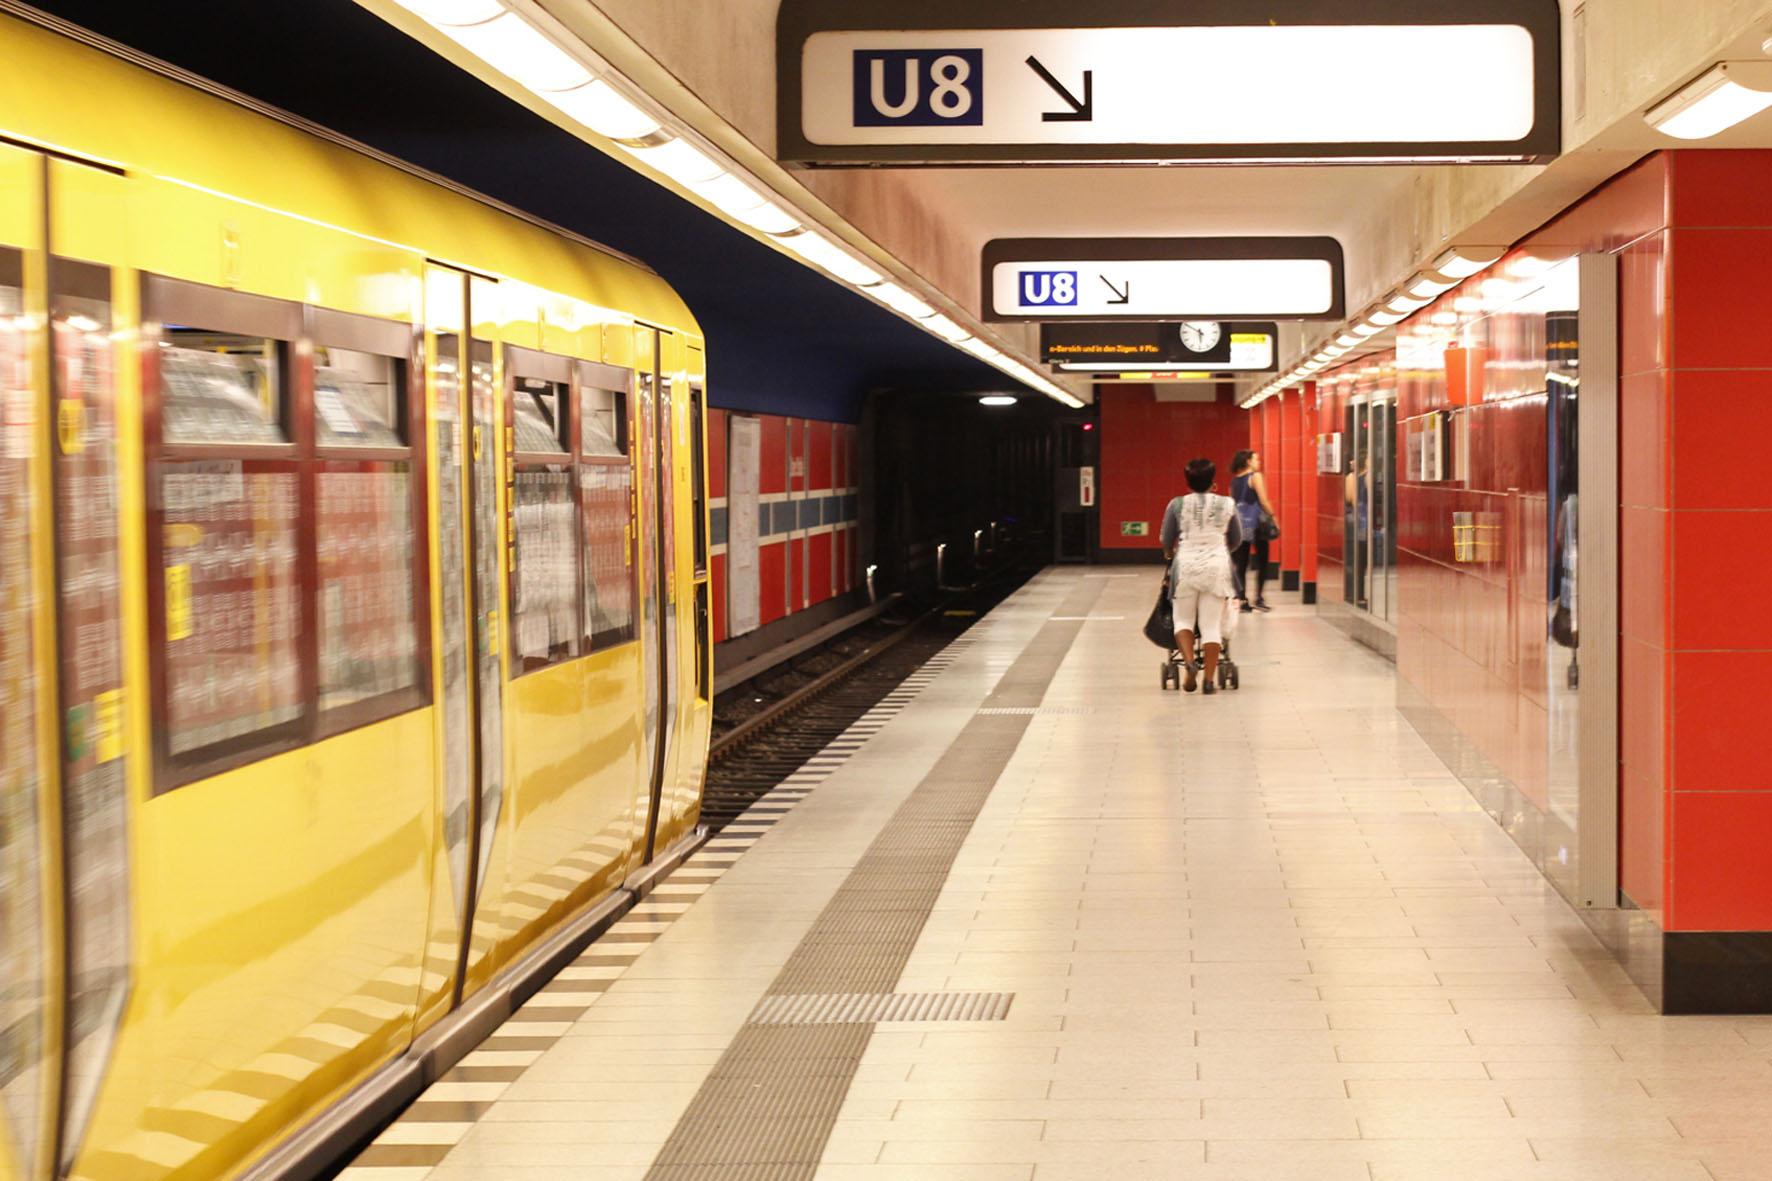 BVG Free Wi-Fi Trial at U-Bahnhof Osloer Straße - Berlin Love